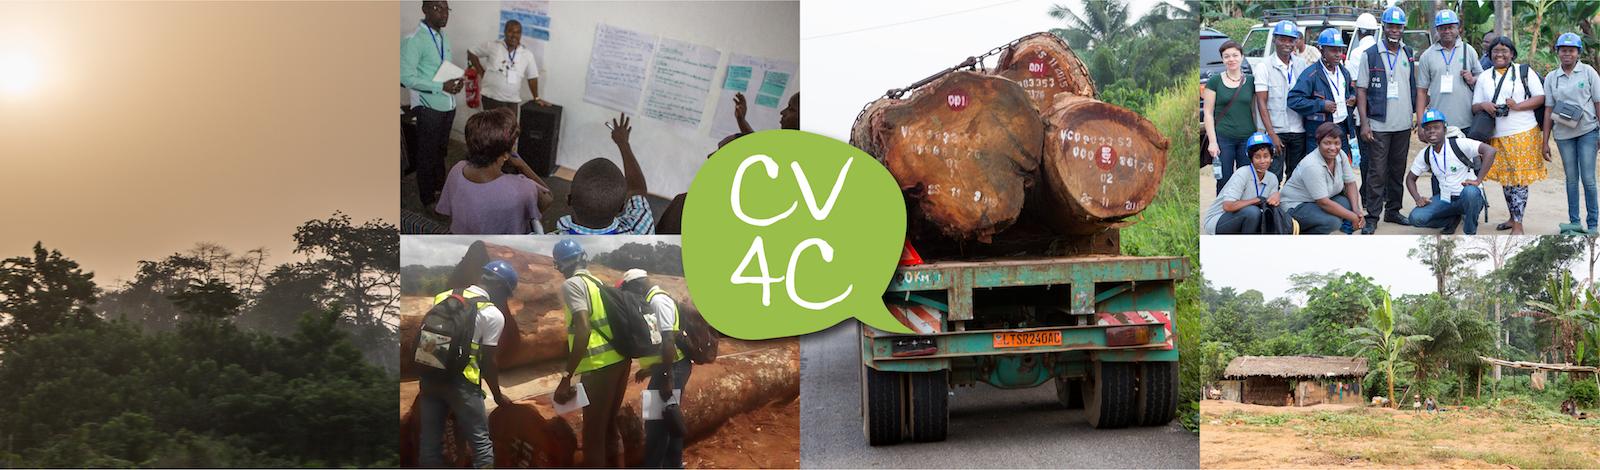 CV4C banner